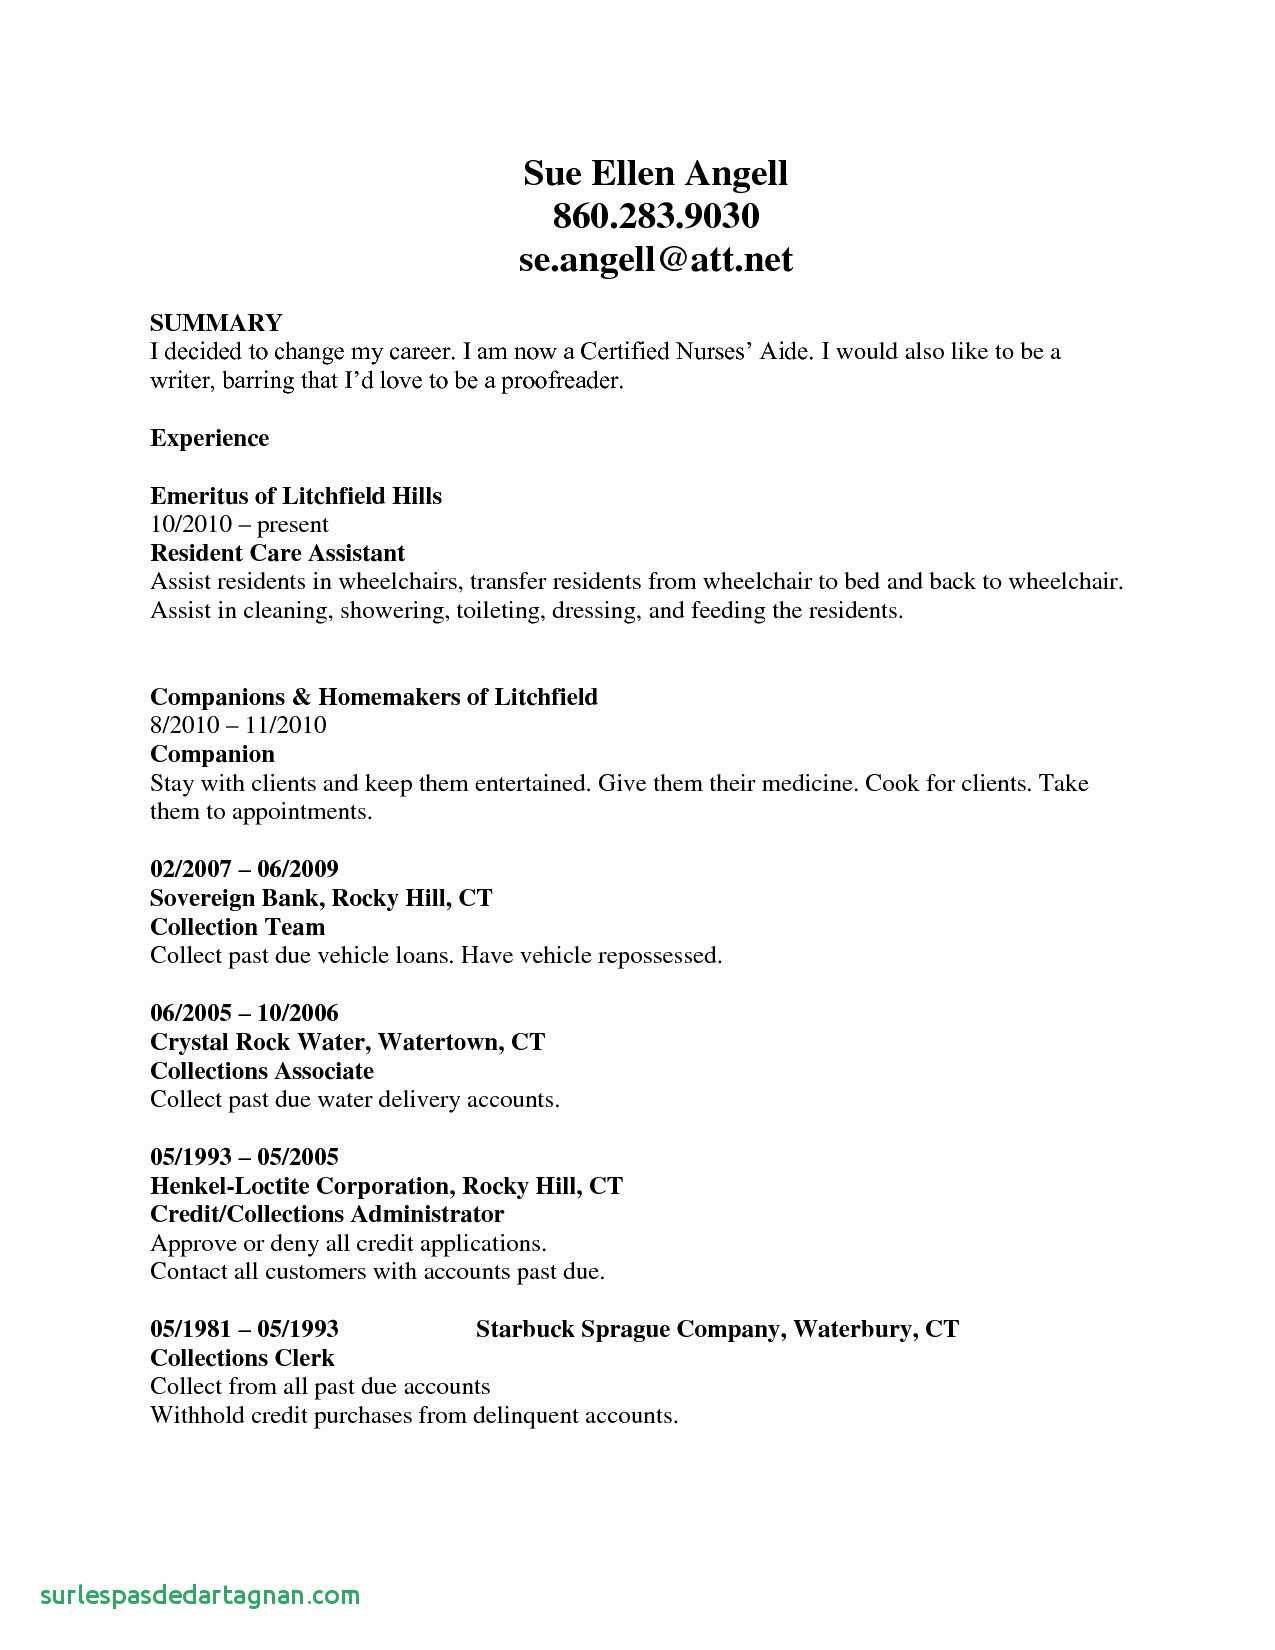 car repossession letter template proofreading resume unique sample nurses resume luxury rn bsn resume